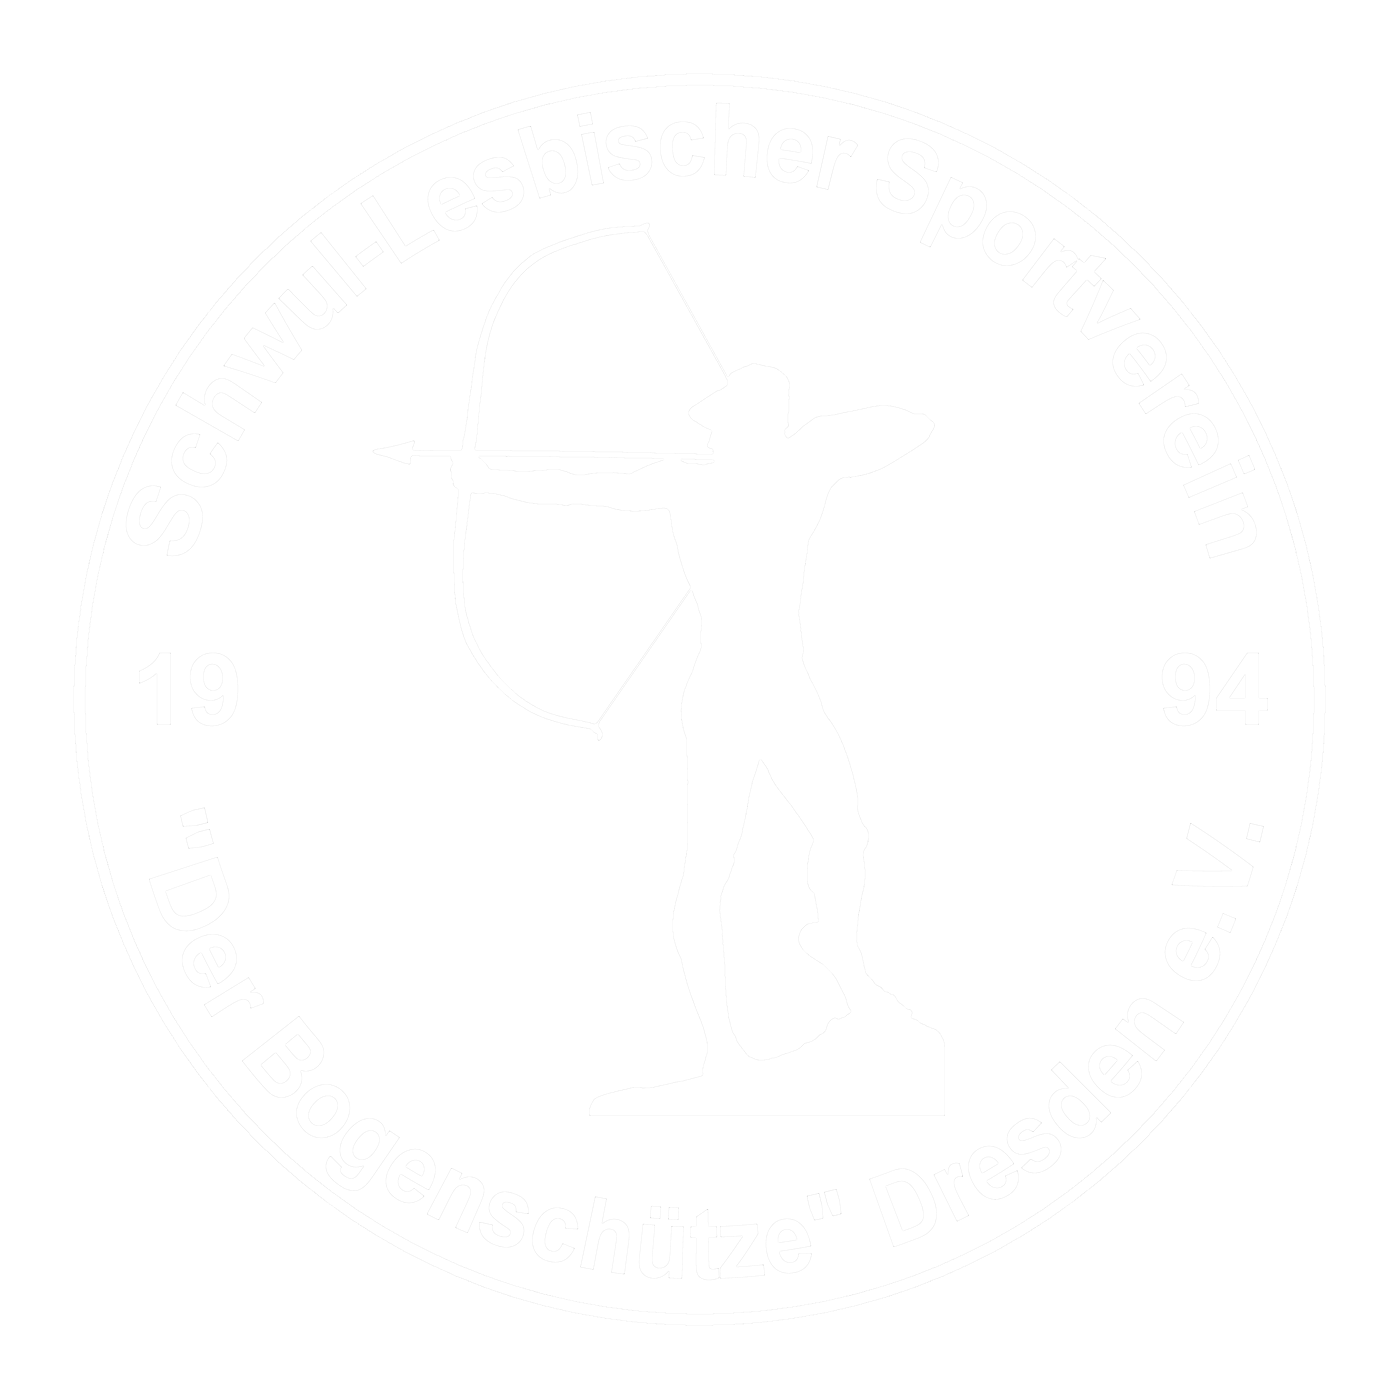 "Schwul-Lesbischer Sportverein ""Der Bogenschütze"" Dresden e.V."